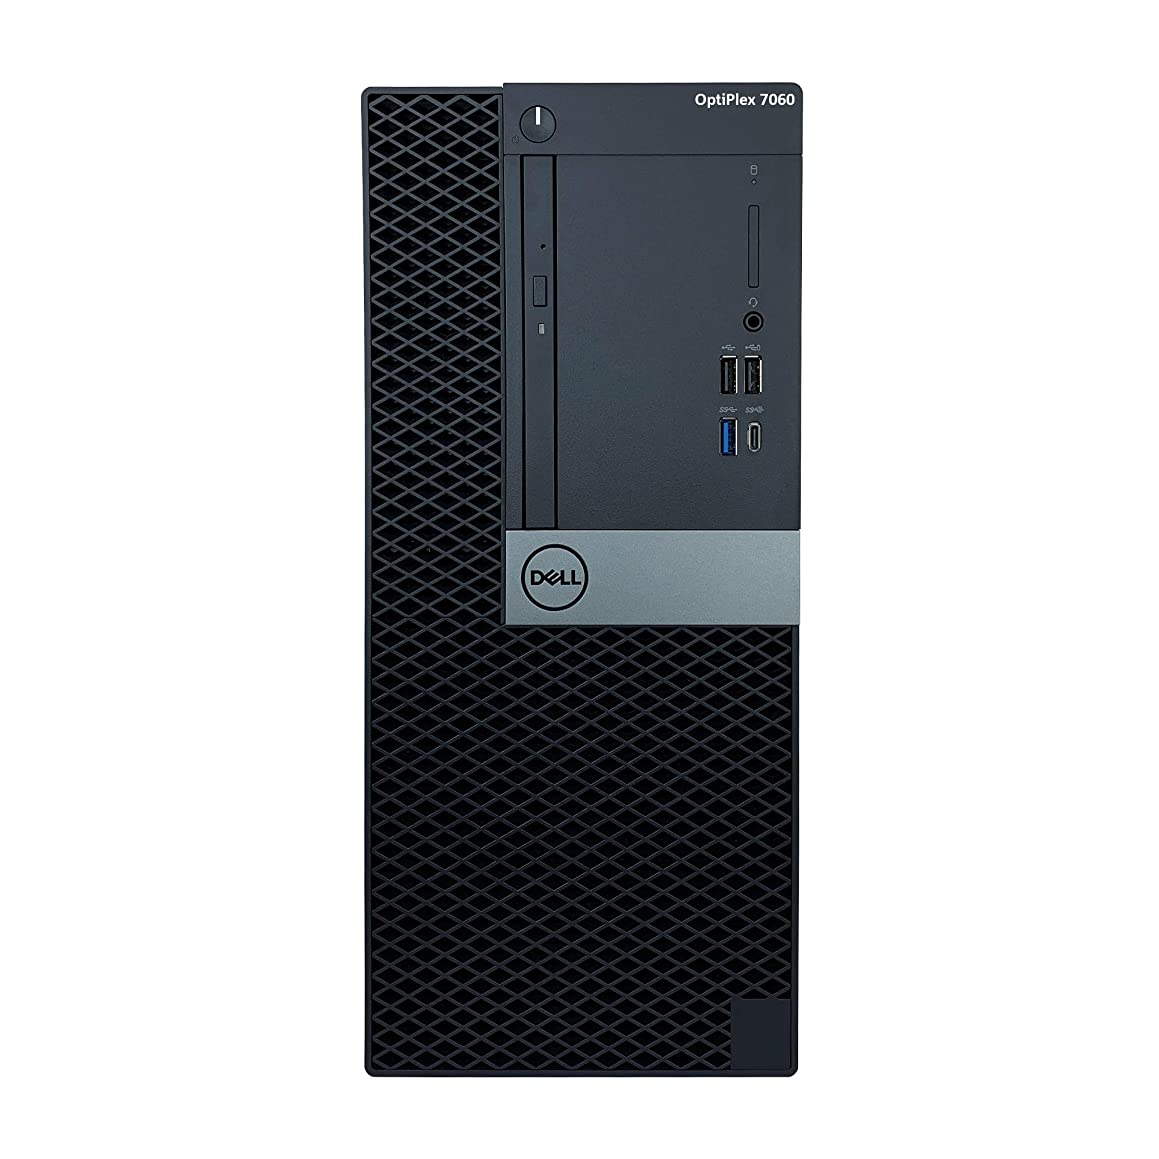 Dell Optiplex 5060 Tower Desktop - 8th Gen Intel Core i5-8500 3.00GHz (Up to 4.10GHz), 16GB DDR4 2666MHz Memory, 1TB SSD, Intel UHD Graphics 630, Windows 10 Pro